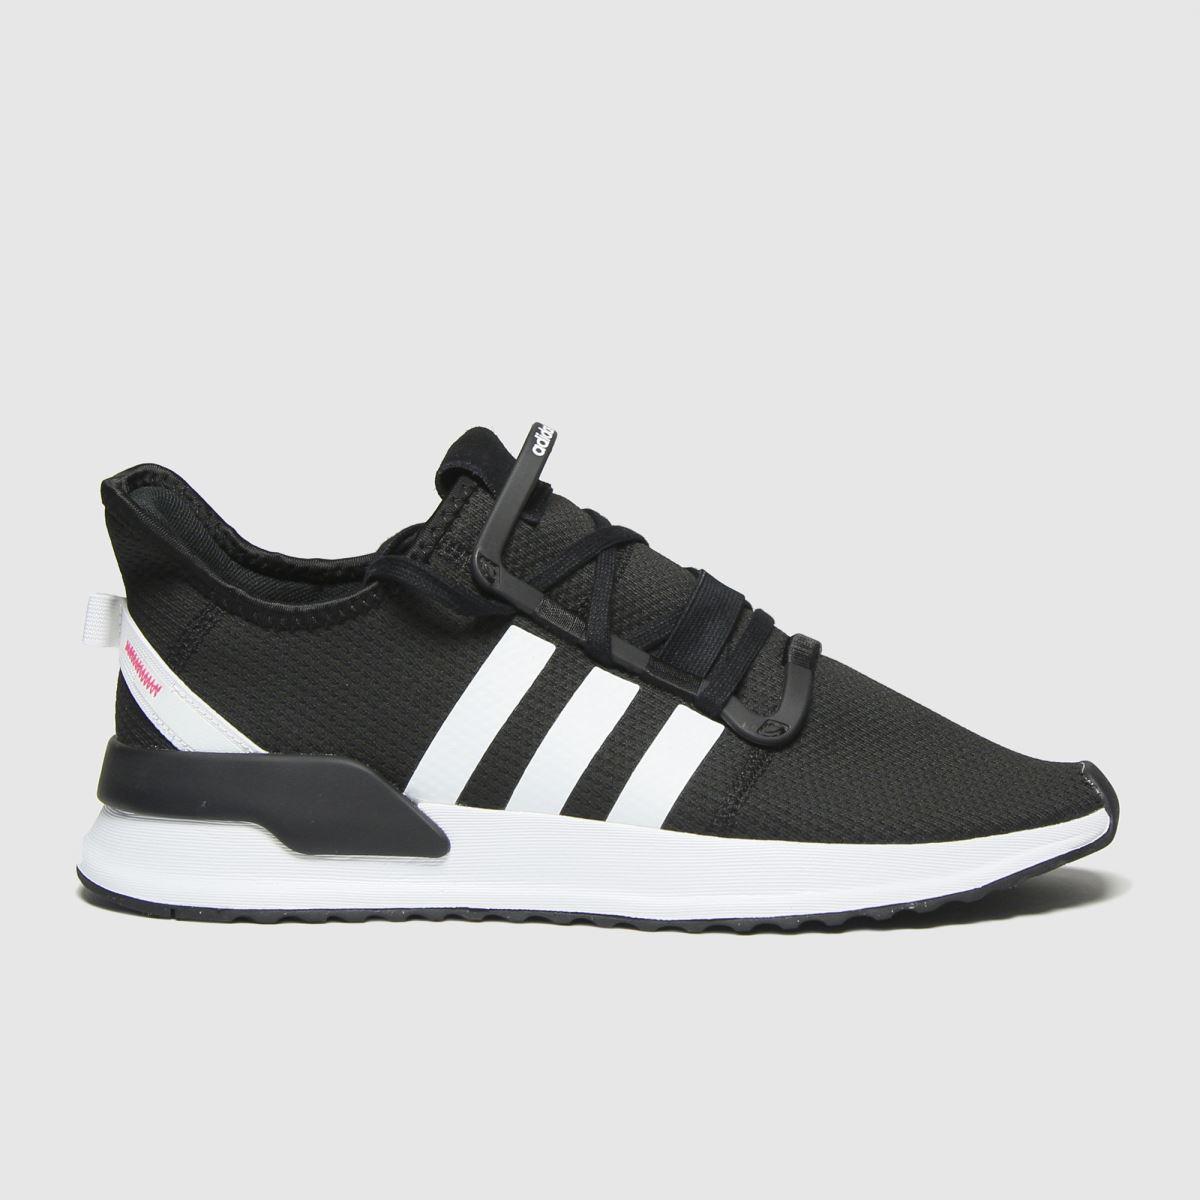 Adidas Black & White U_path Trainers